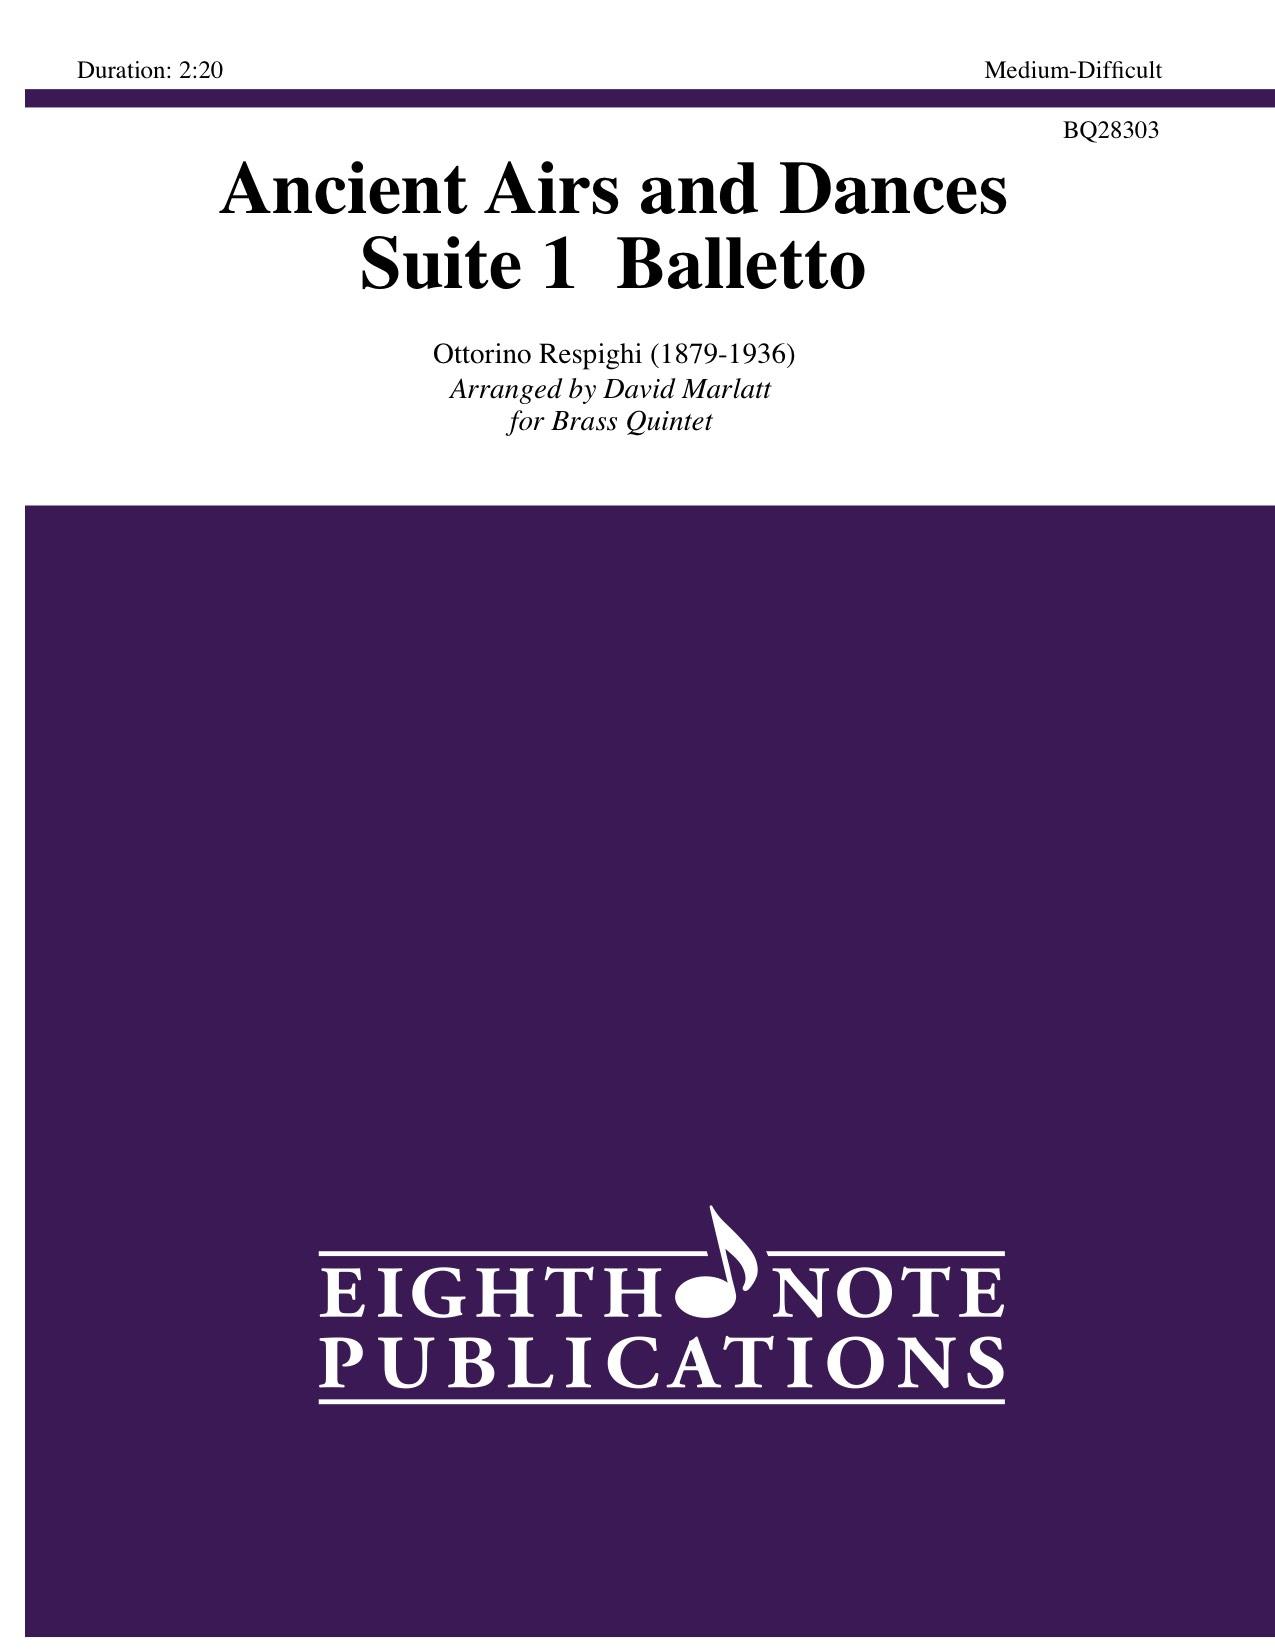 Ancient Airs and Dances - Suite 1  Balletto - Ottorino Respighi